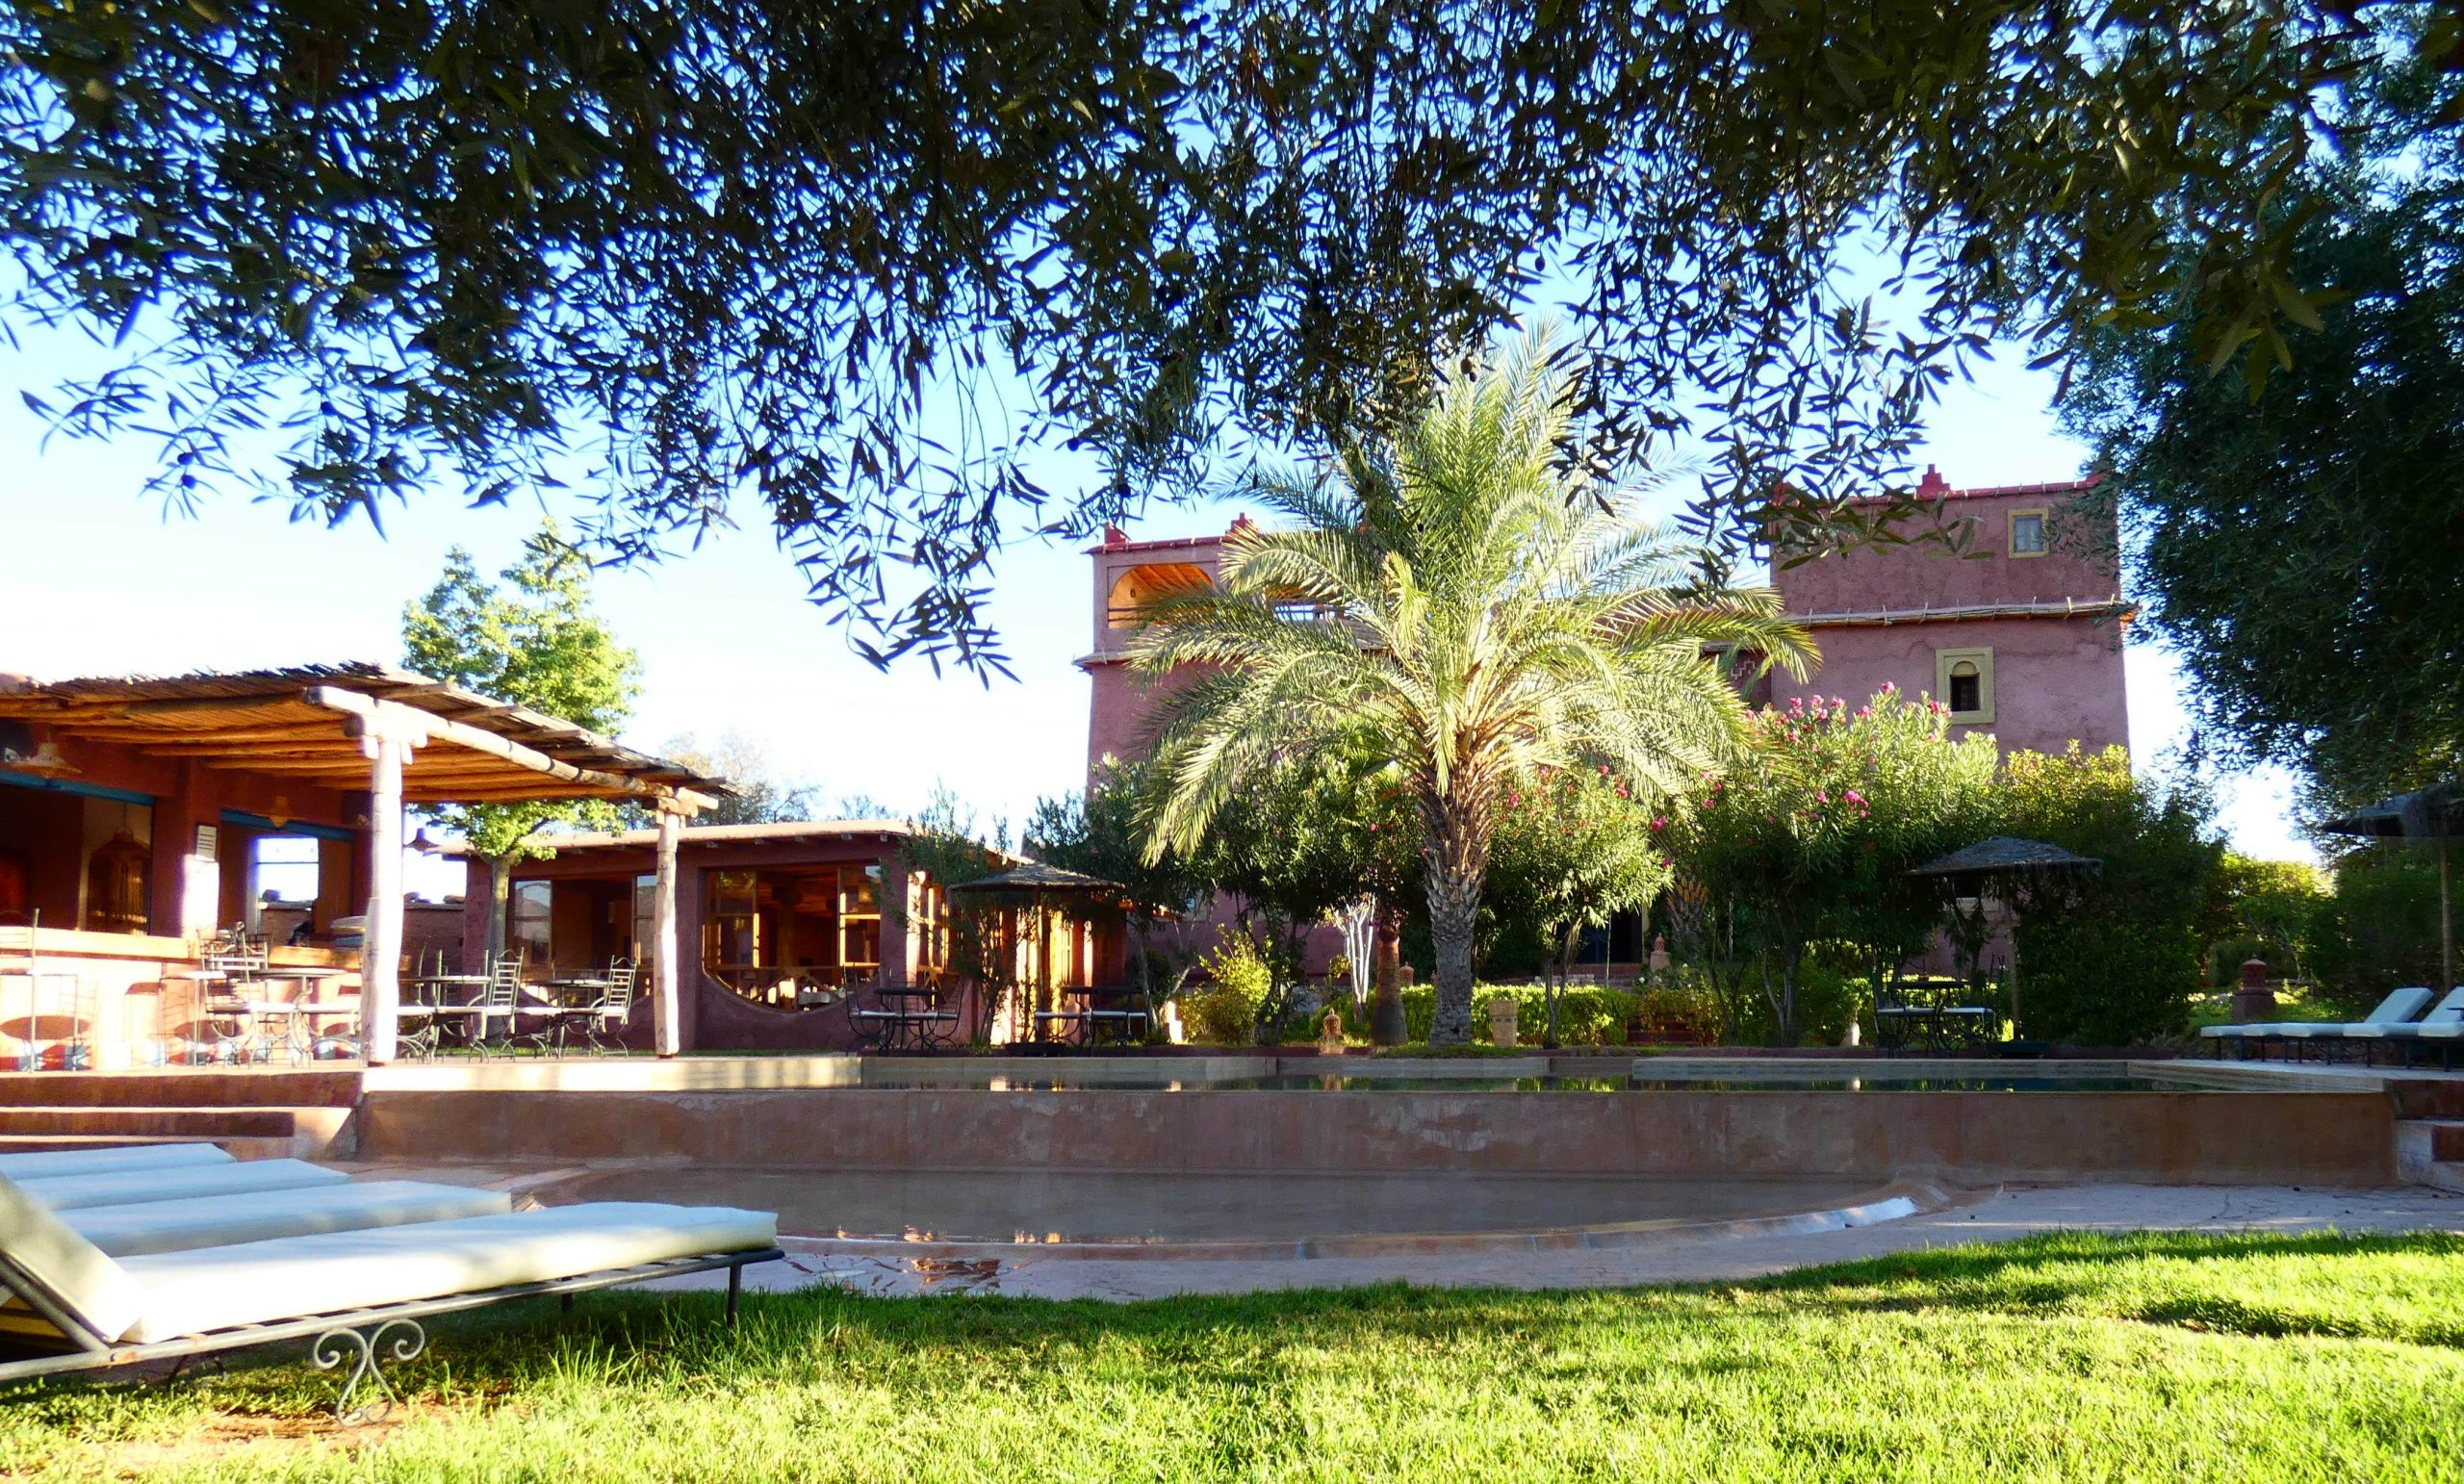 Hotel Kasbah Marruecos